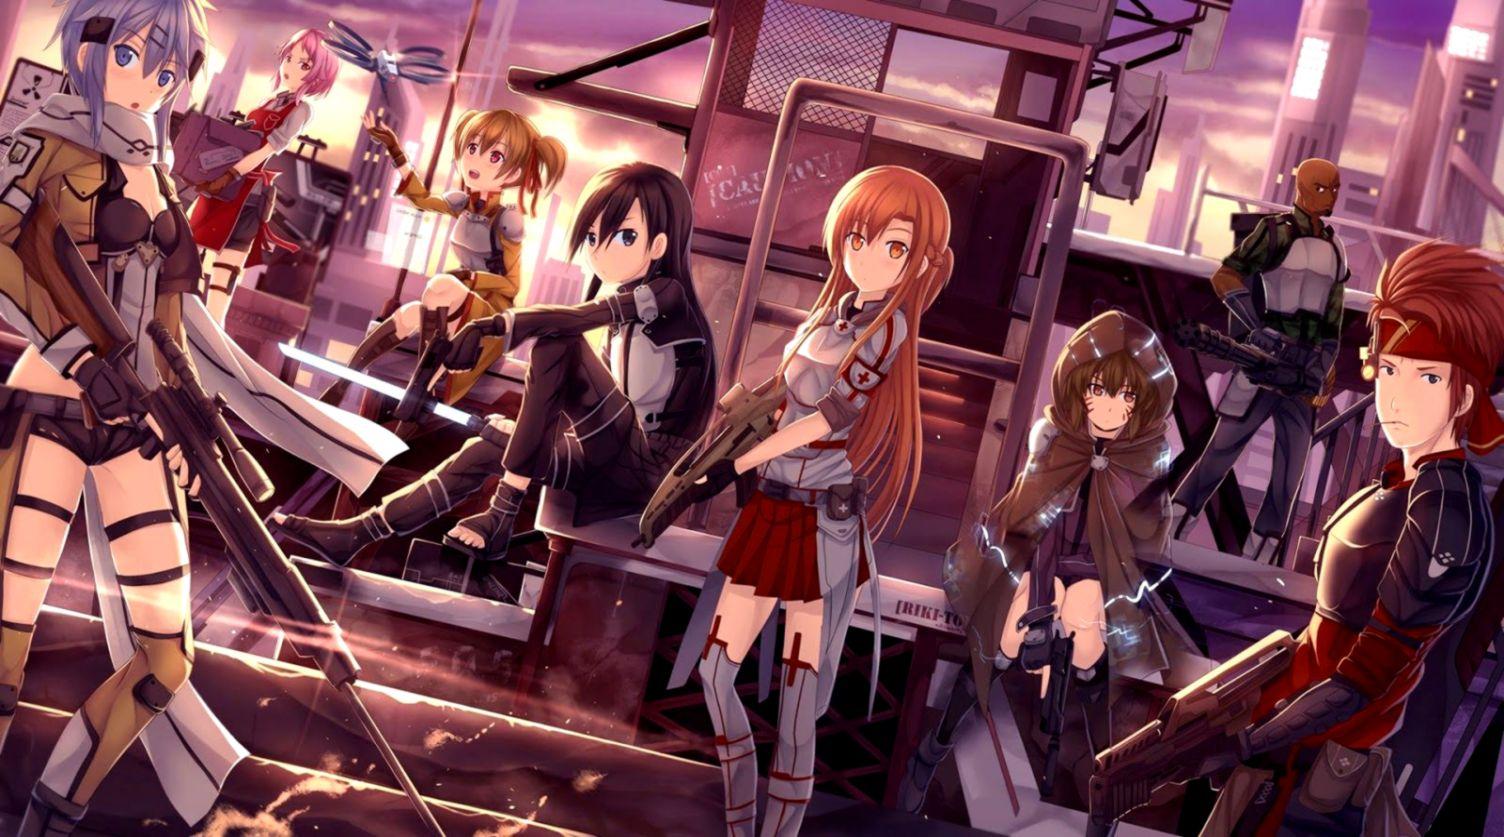 Gun Gale Online Sinon And Kirito Images Hd Wallpaper